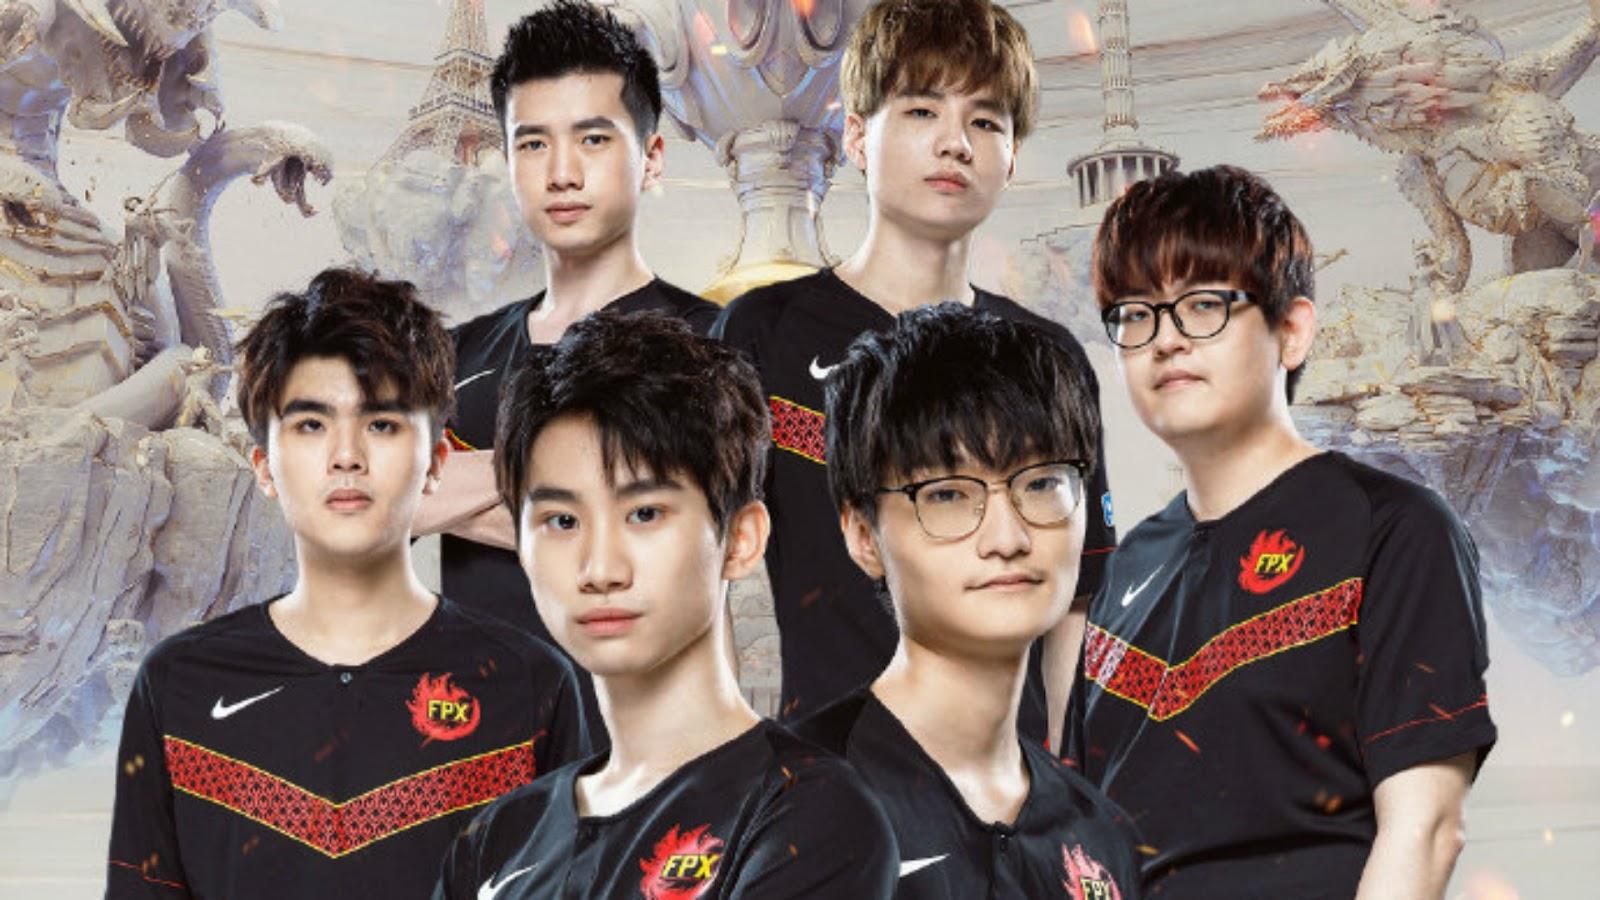 The-top-ten-esports-teams-of-2019-part-2